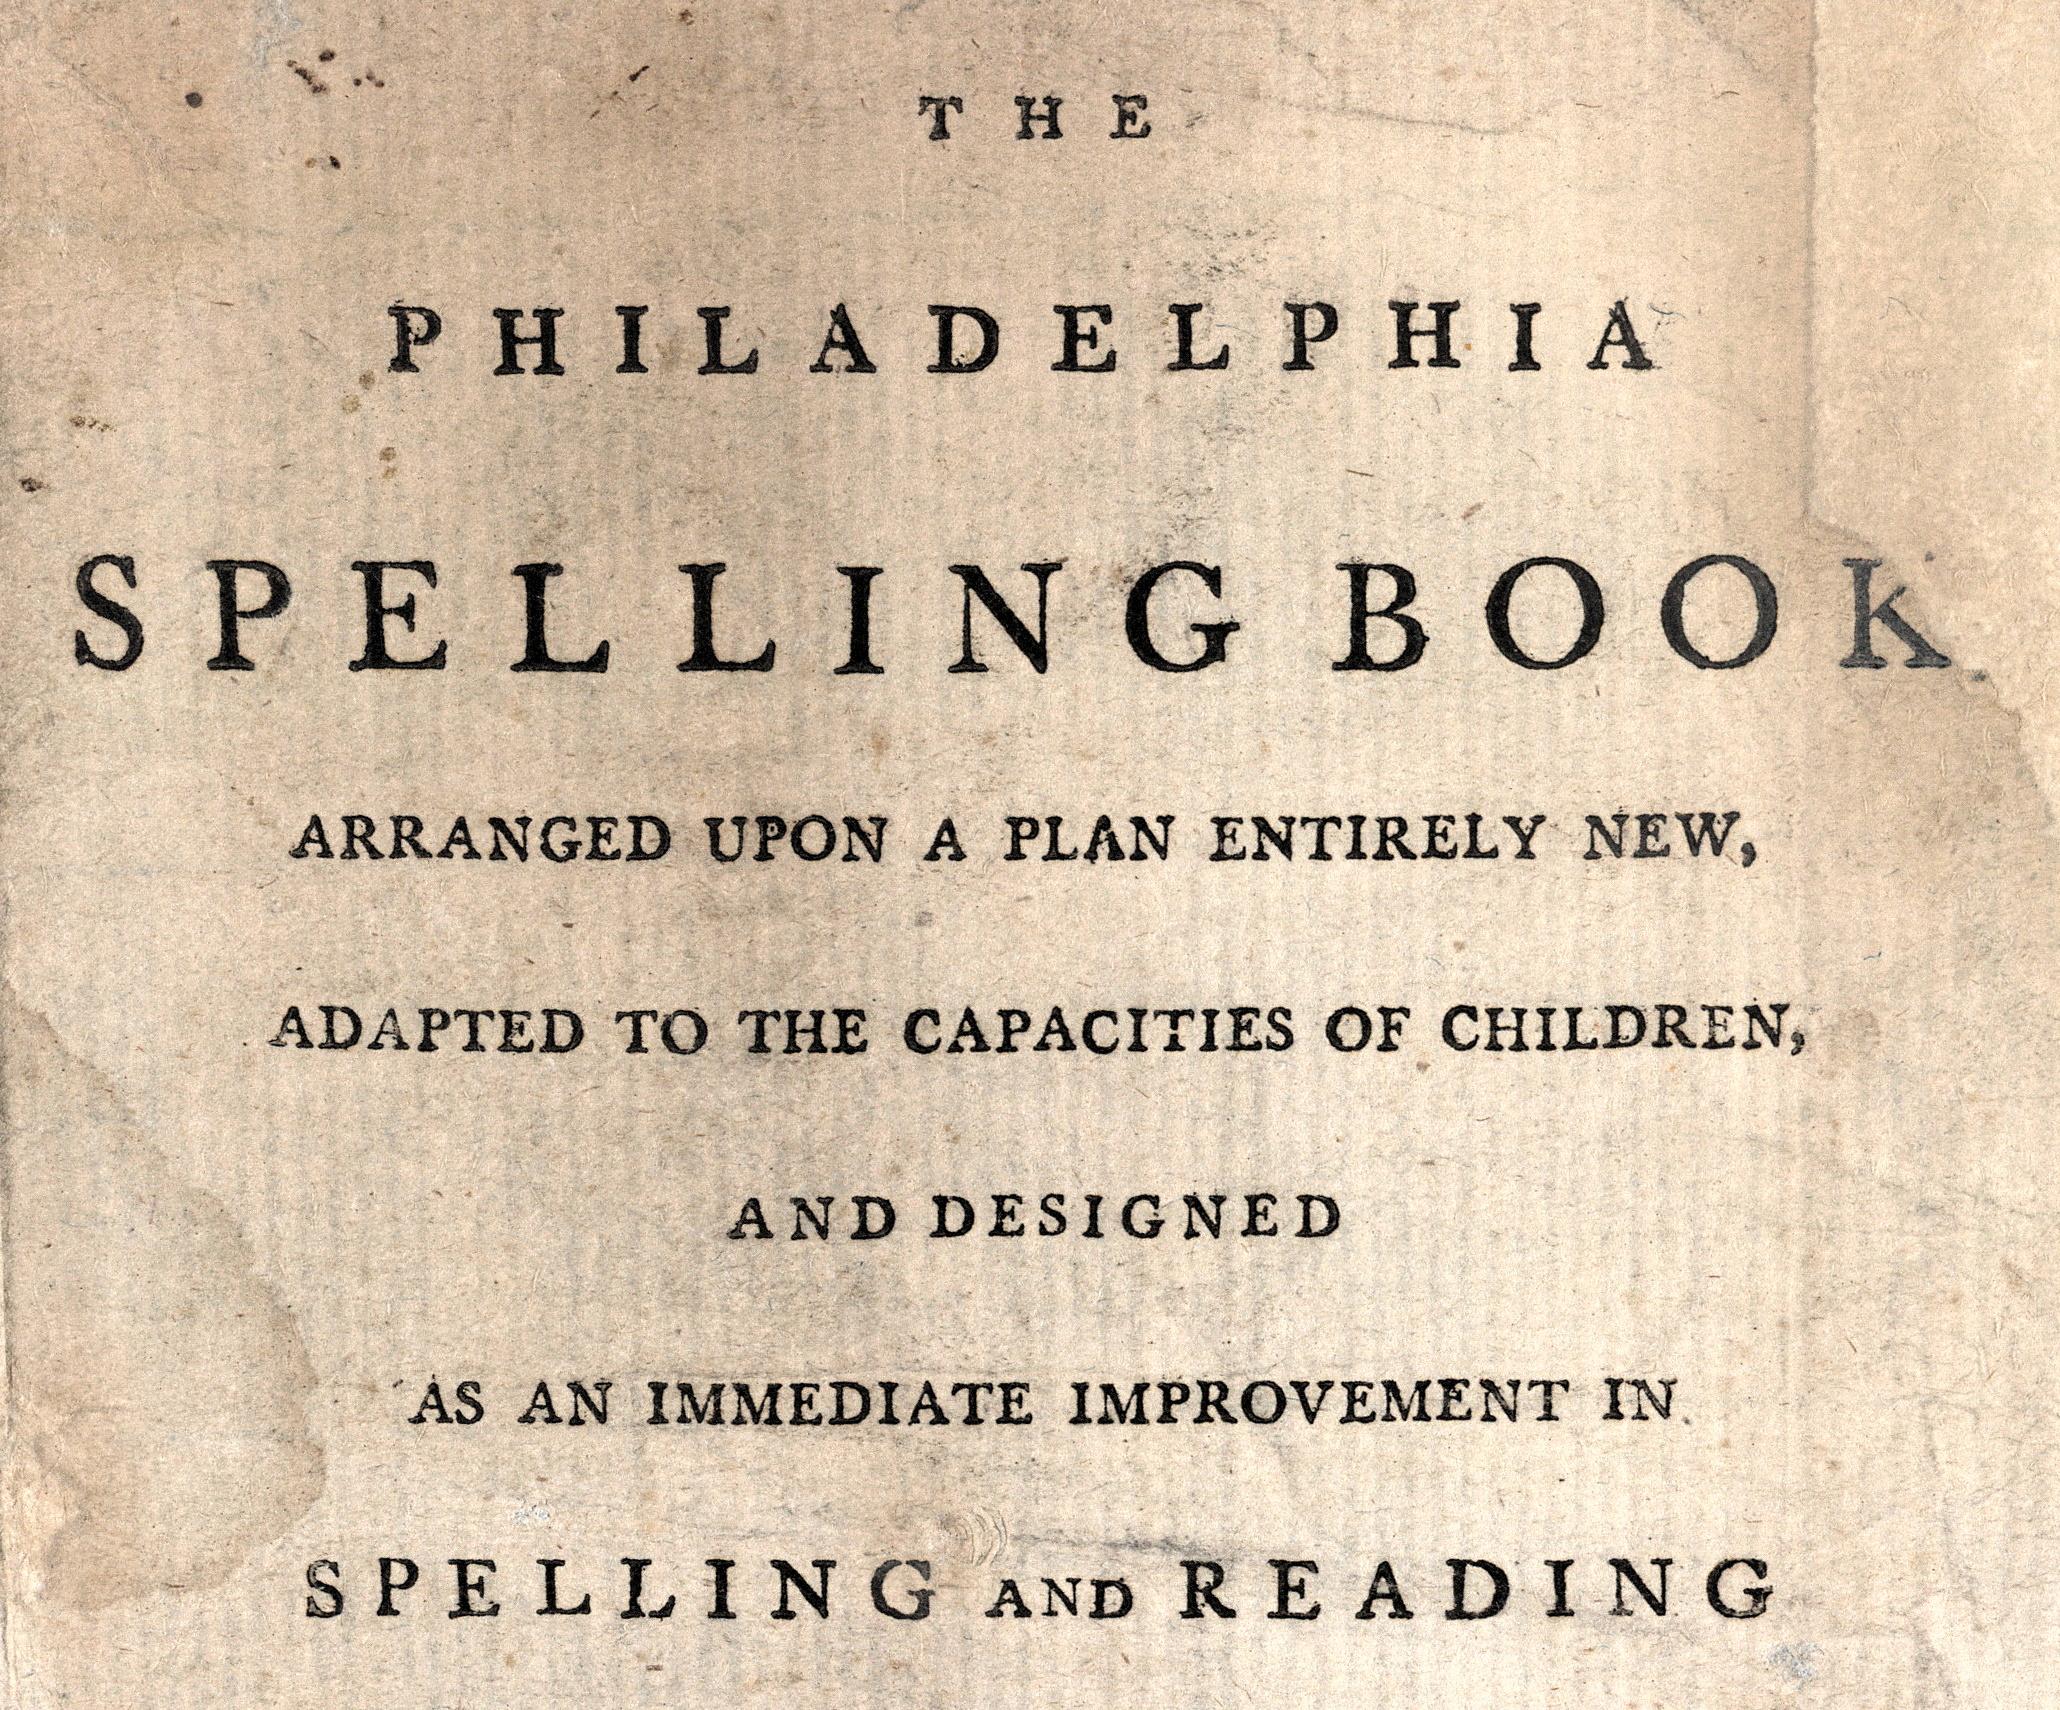 Public domain, via Library of Congress ( http://www.loc.gov/item/99172032/ ).